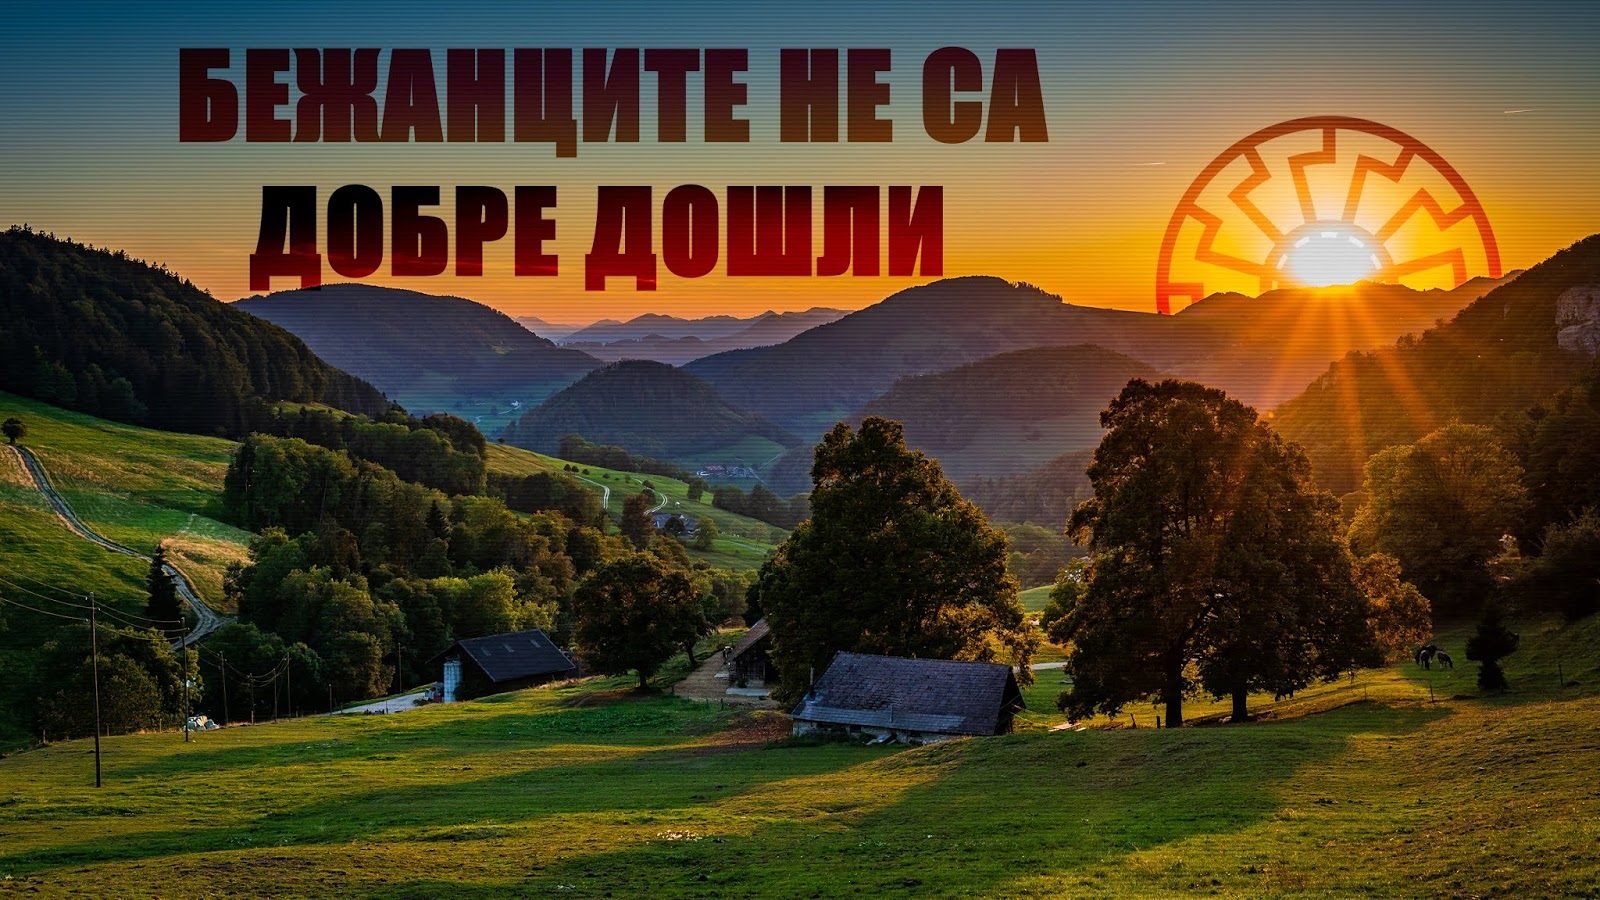 https://1.bp.blogspot.com/-kkiiCYShsdQ/Xc__0OdvZzI/AAAAAAAAAz4/hpEapmcn1A4bT6SH5bWyciwOgGD4l64yACLcBGAsYHQ/s1600/Germany_Mountains_Sunrises_and_sunsets_Houses_568280_3840x2160.jpg